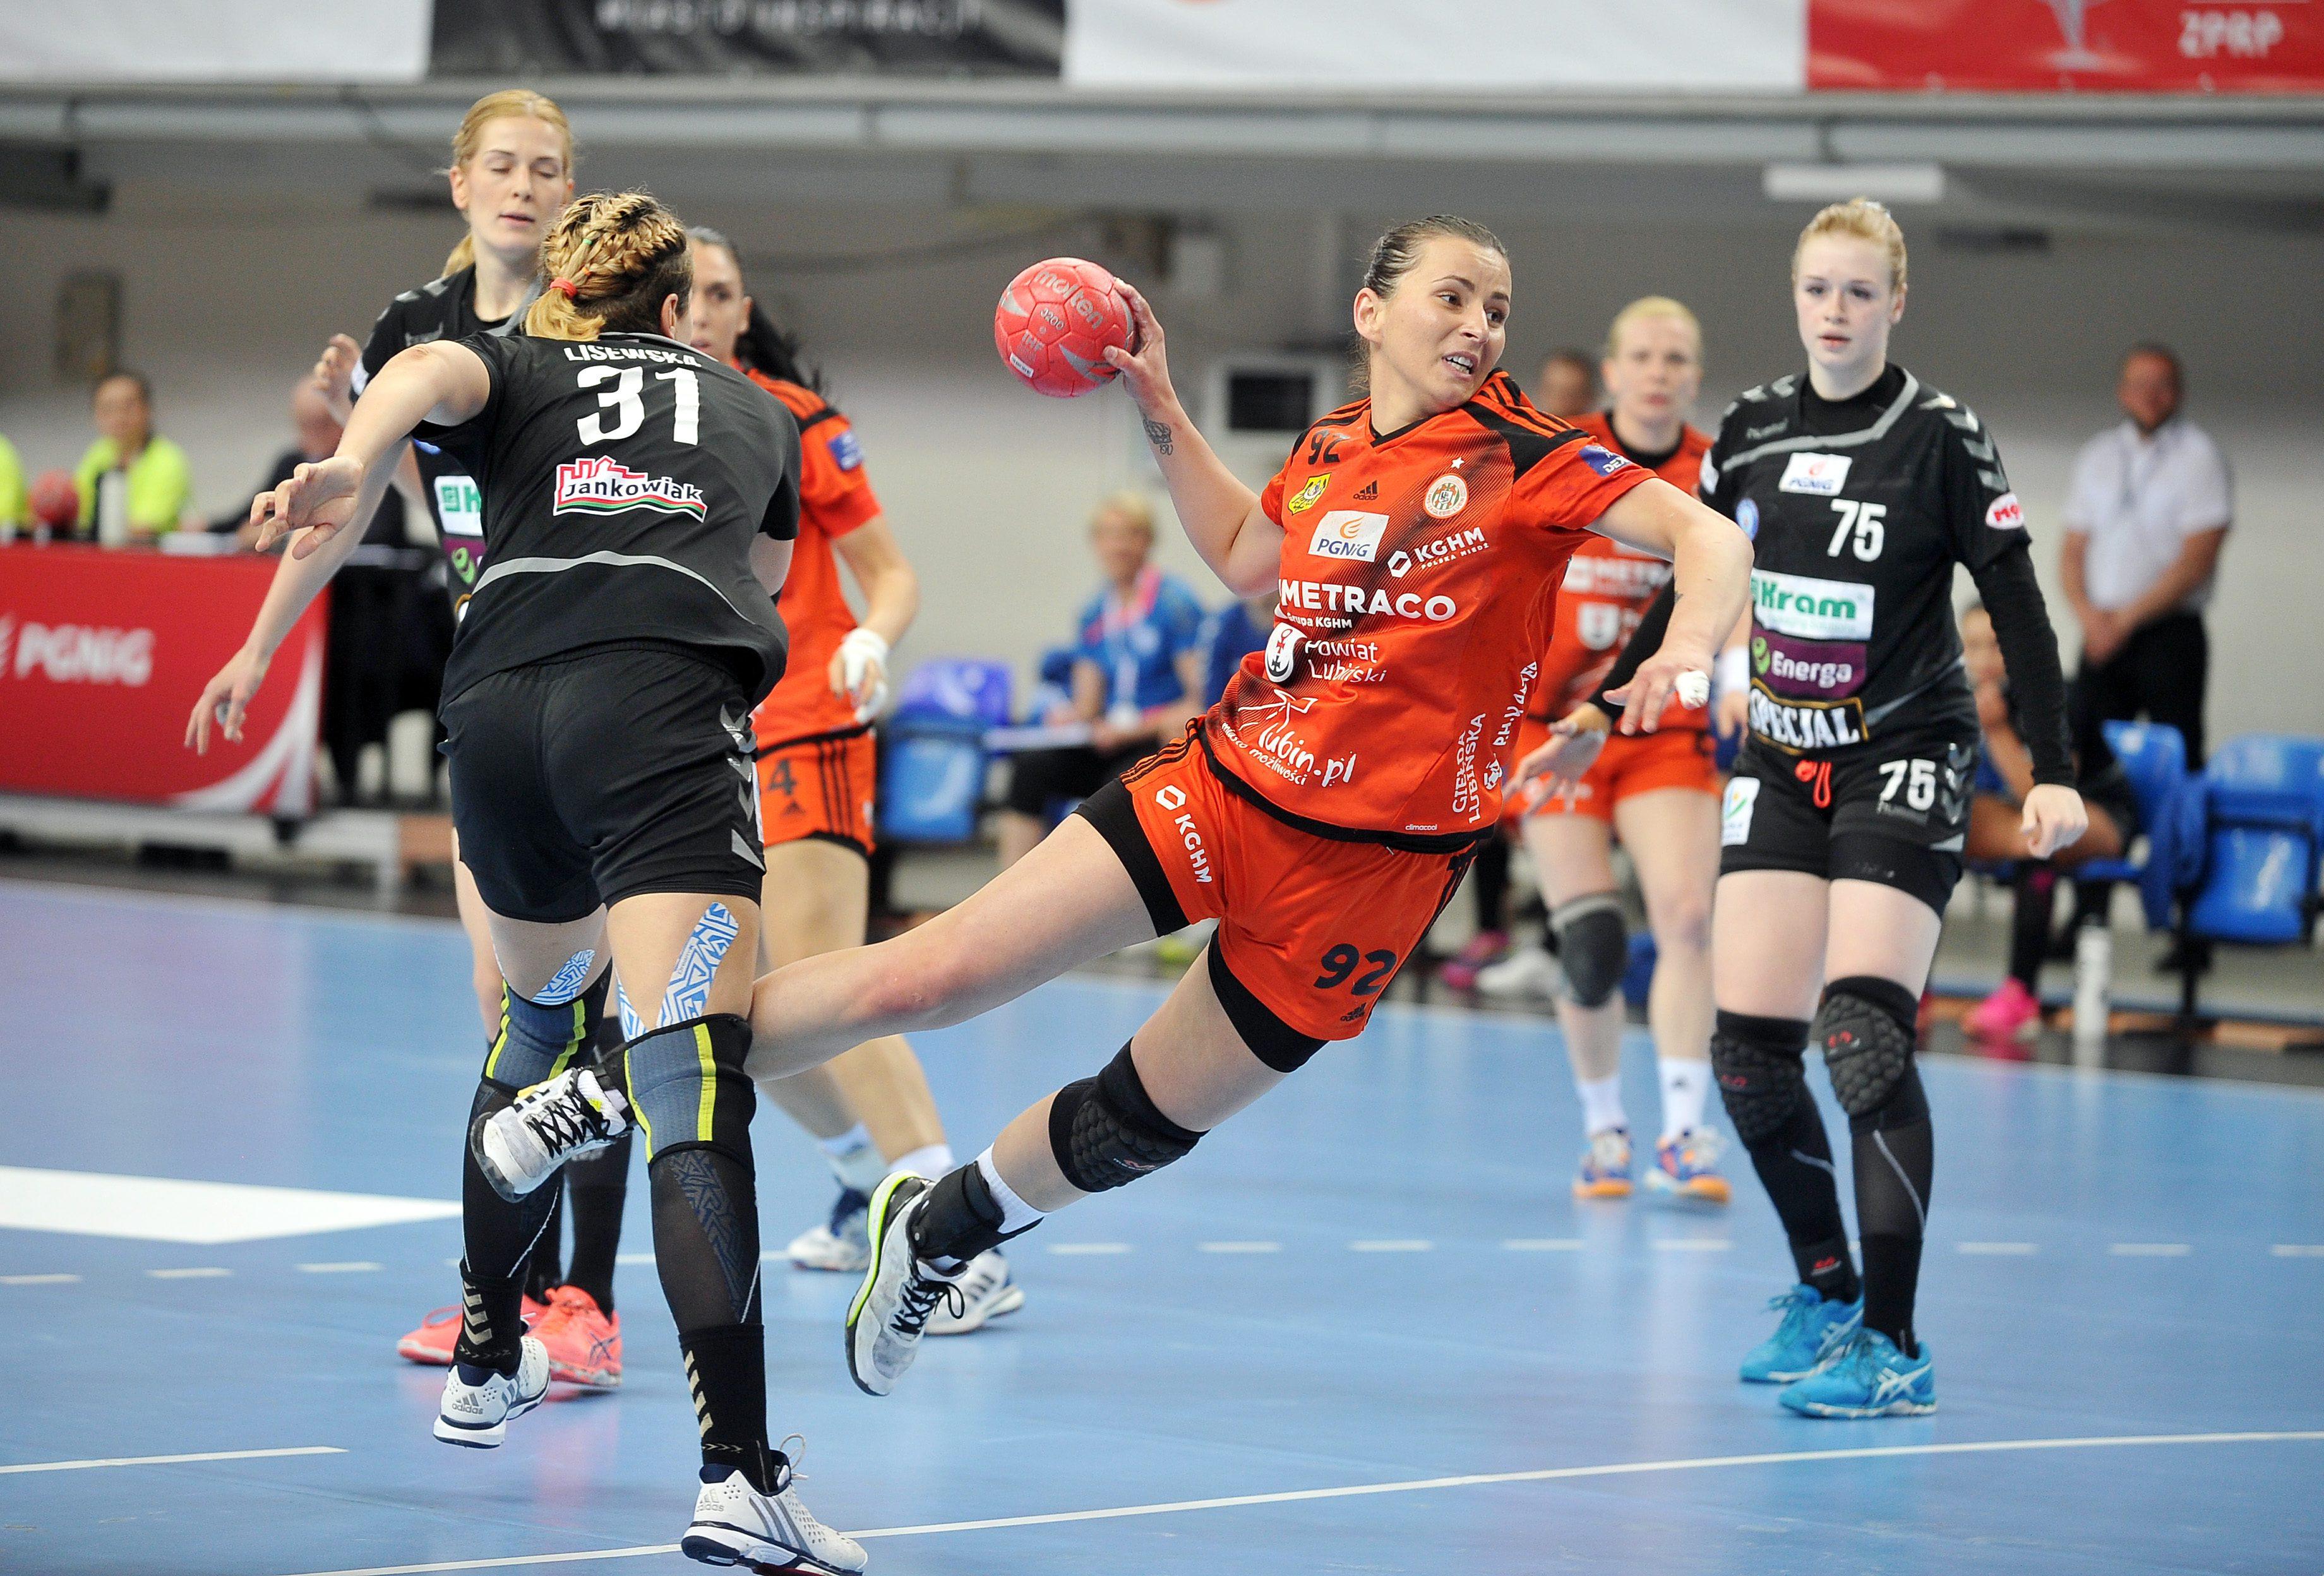 Fot. Norbert Barczyk / PressFocus 2017.05.20 Lublin Handball Polish Cup FInal women Season 2016/2017 Metraco Zaglebie Lubin - KRAM Start Elblag Jovana Milojevic Credit: Norbert Barczyk / PressFocus